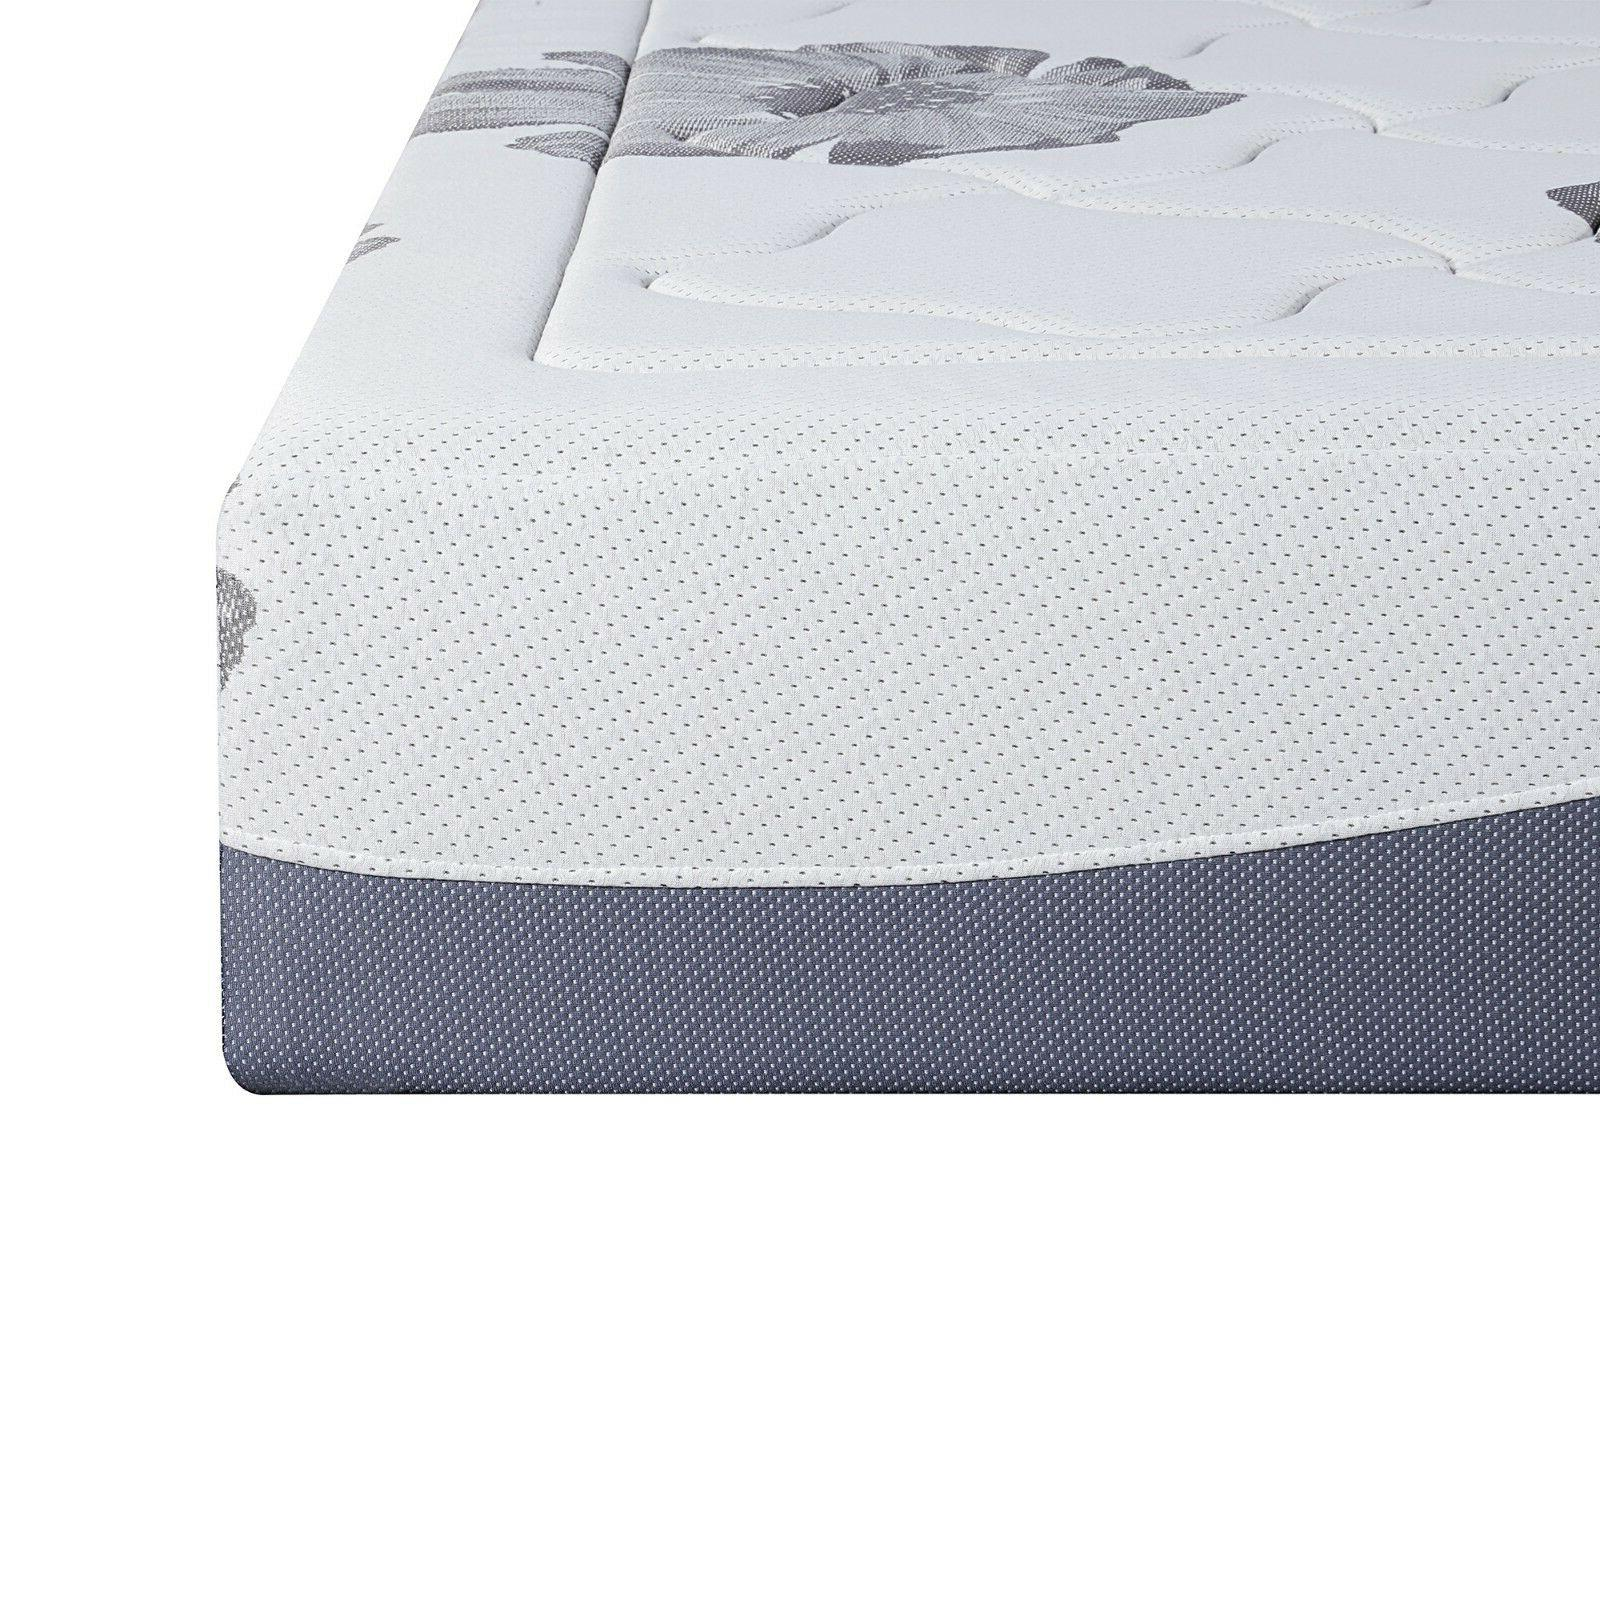 SLEEPLACE Inch Gel Air Flow Foam Mattress, Bedroom, Bed